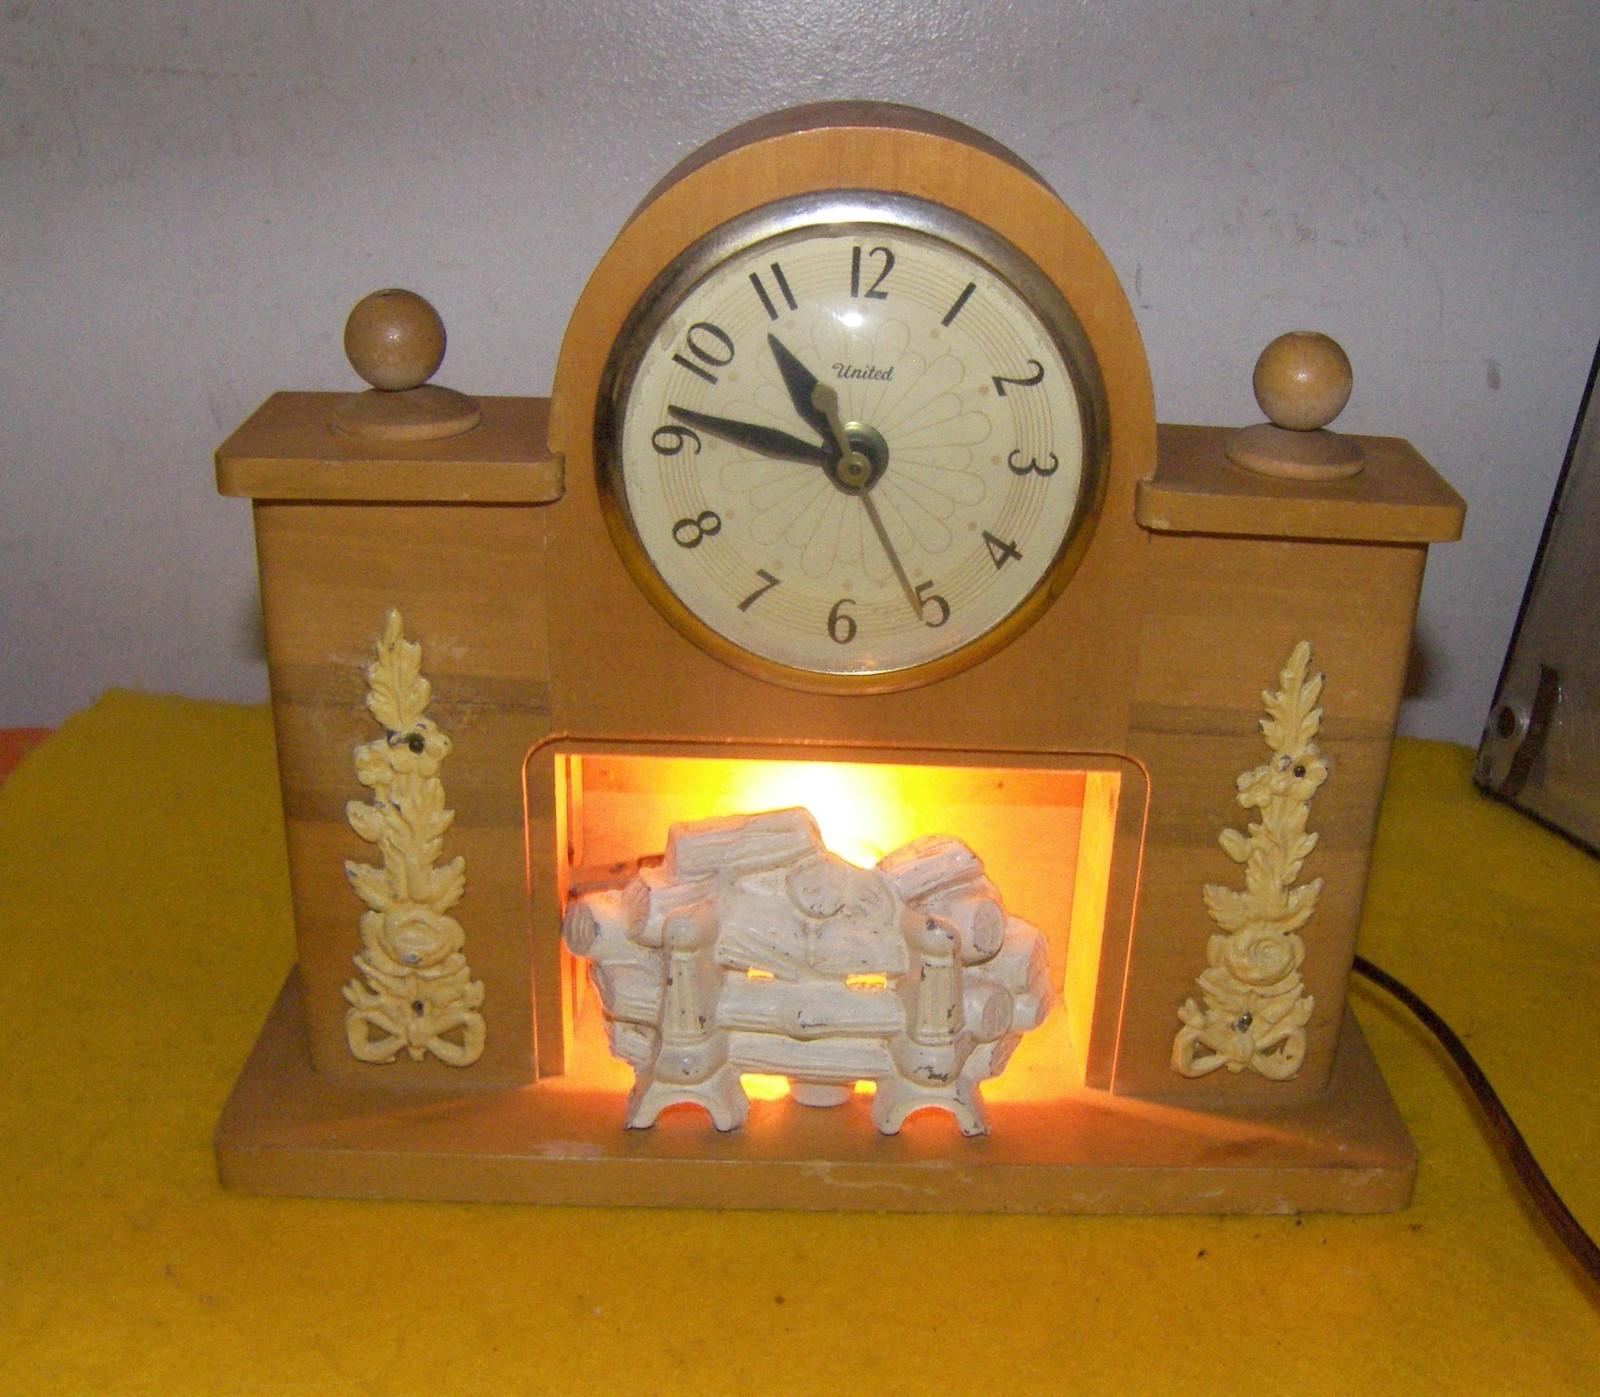 Fireplace Style Mantle Clock Electric Mantel Vintage 1950 S Shelf Mantel